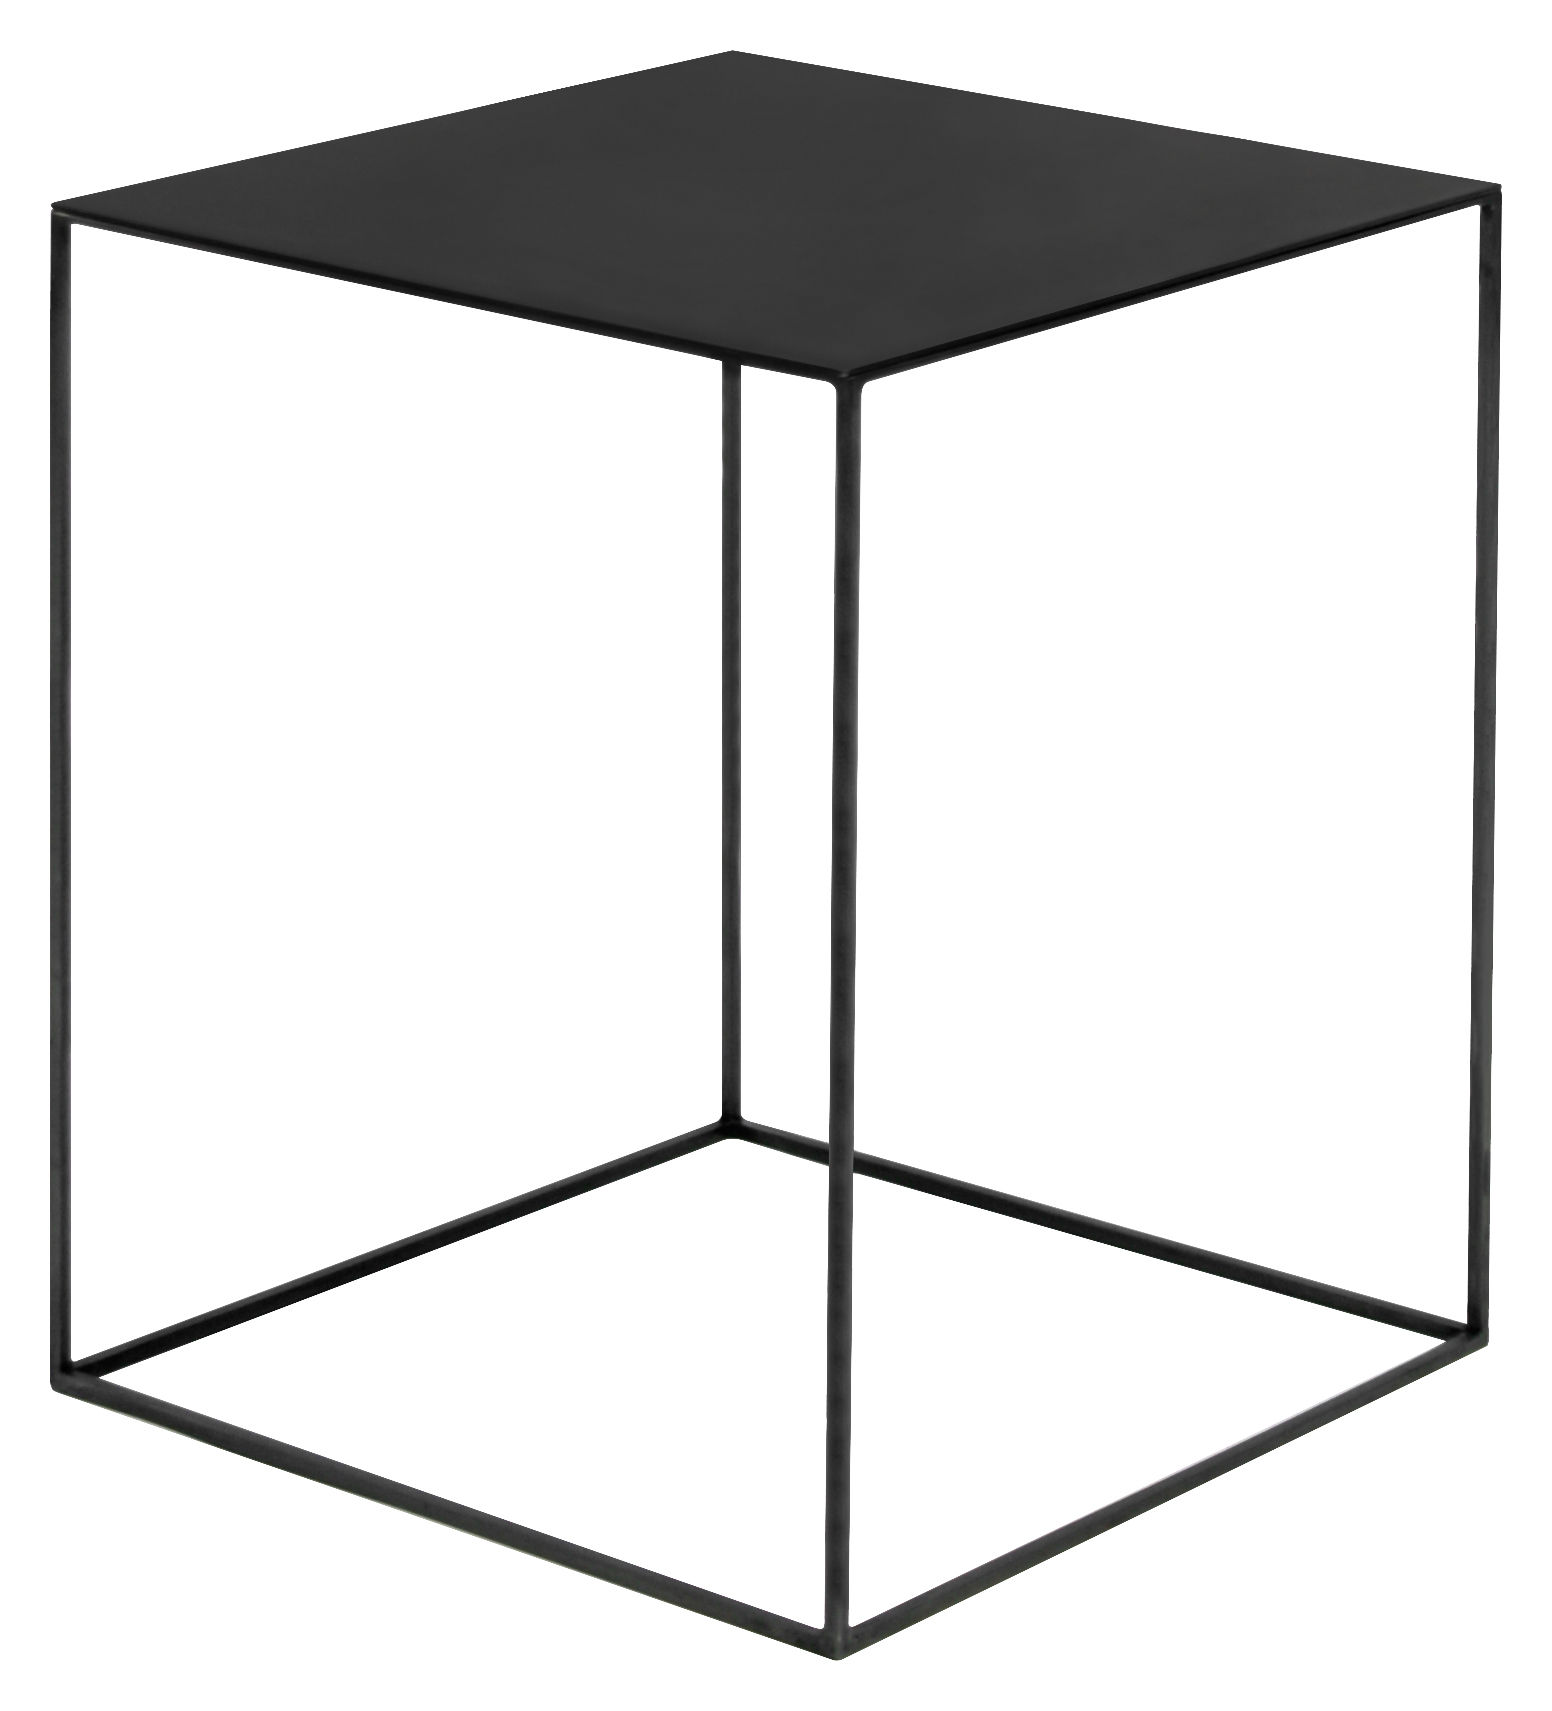 Möbel - Couchtische - Slim Irony Couchtisch / 41 x 41 x H 64 cm - Zeus - Stahl, schwarz - Stahl